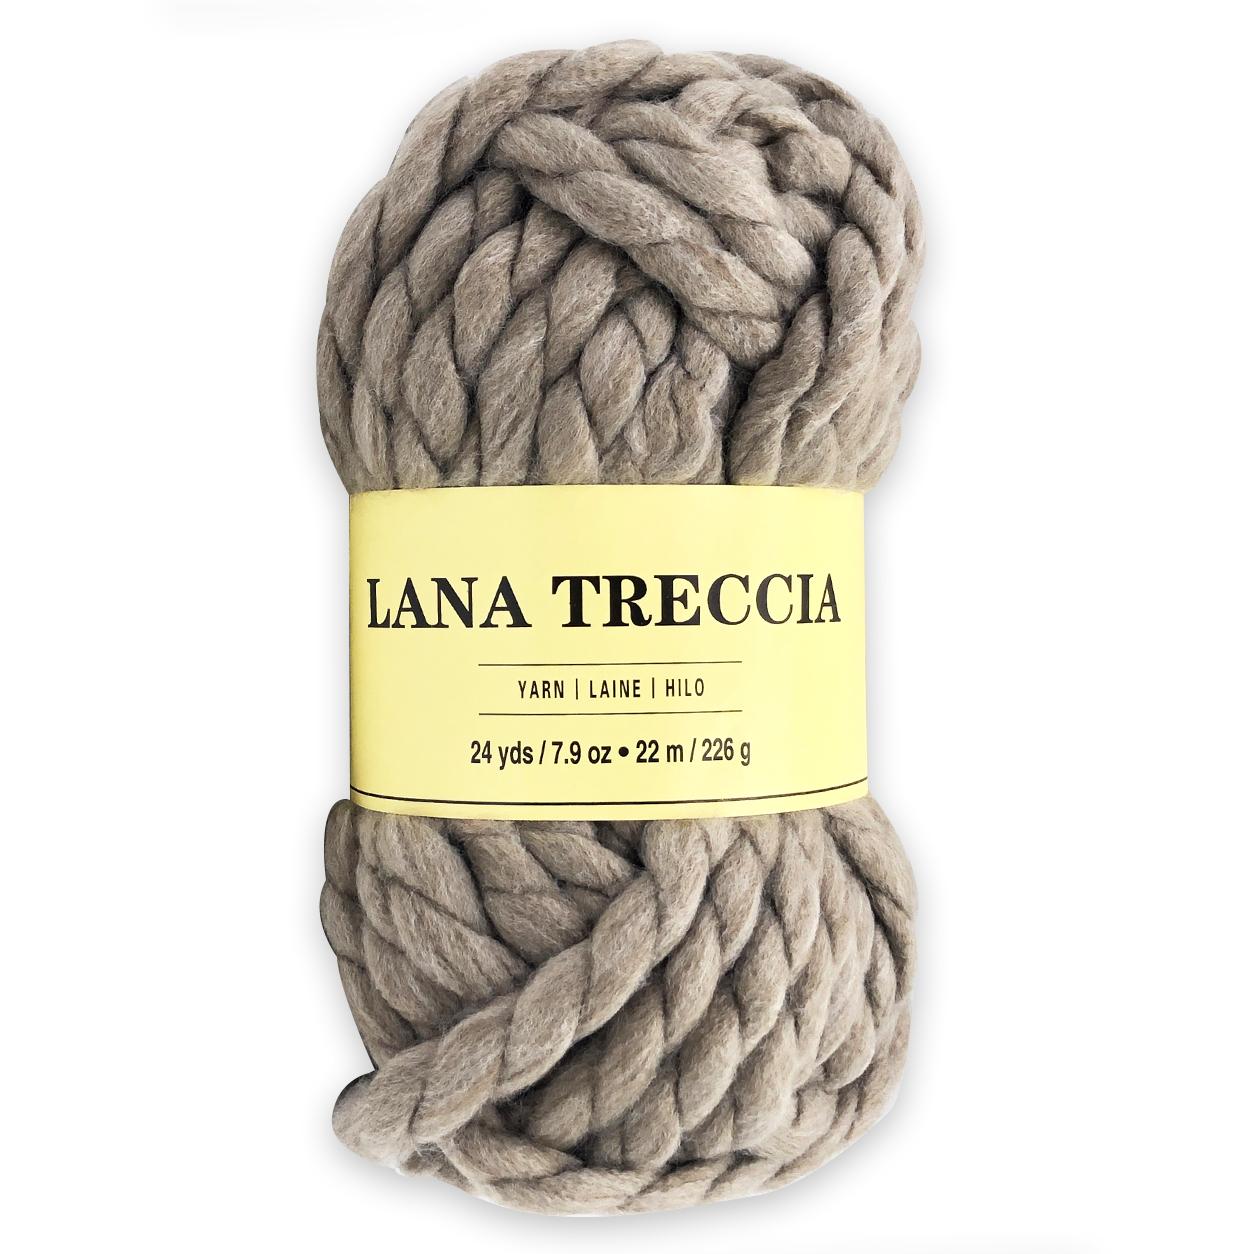 Lana Treccia